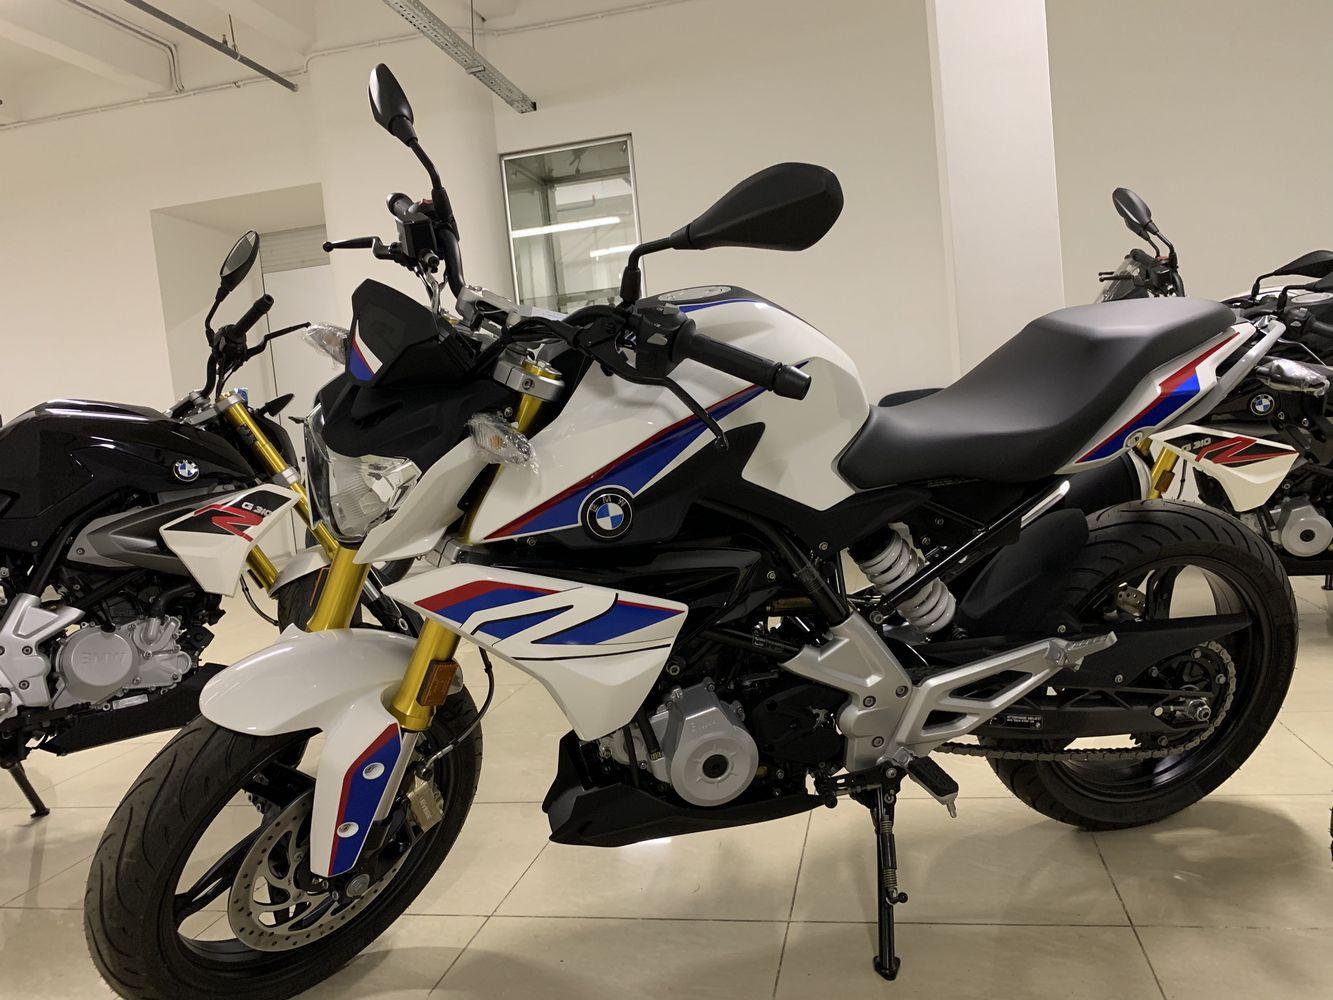 G 310 R MOTORSPORT